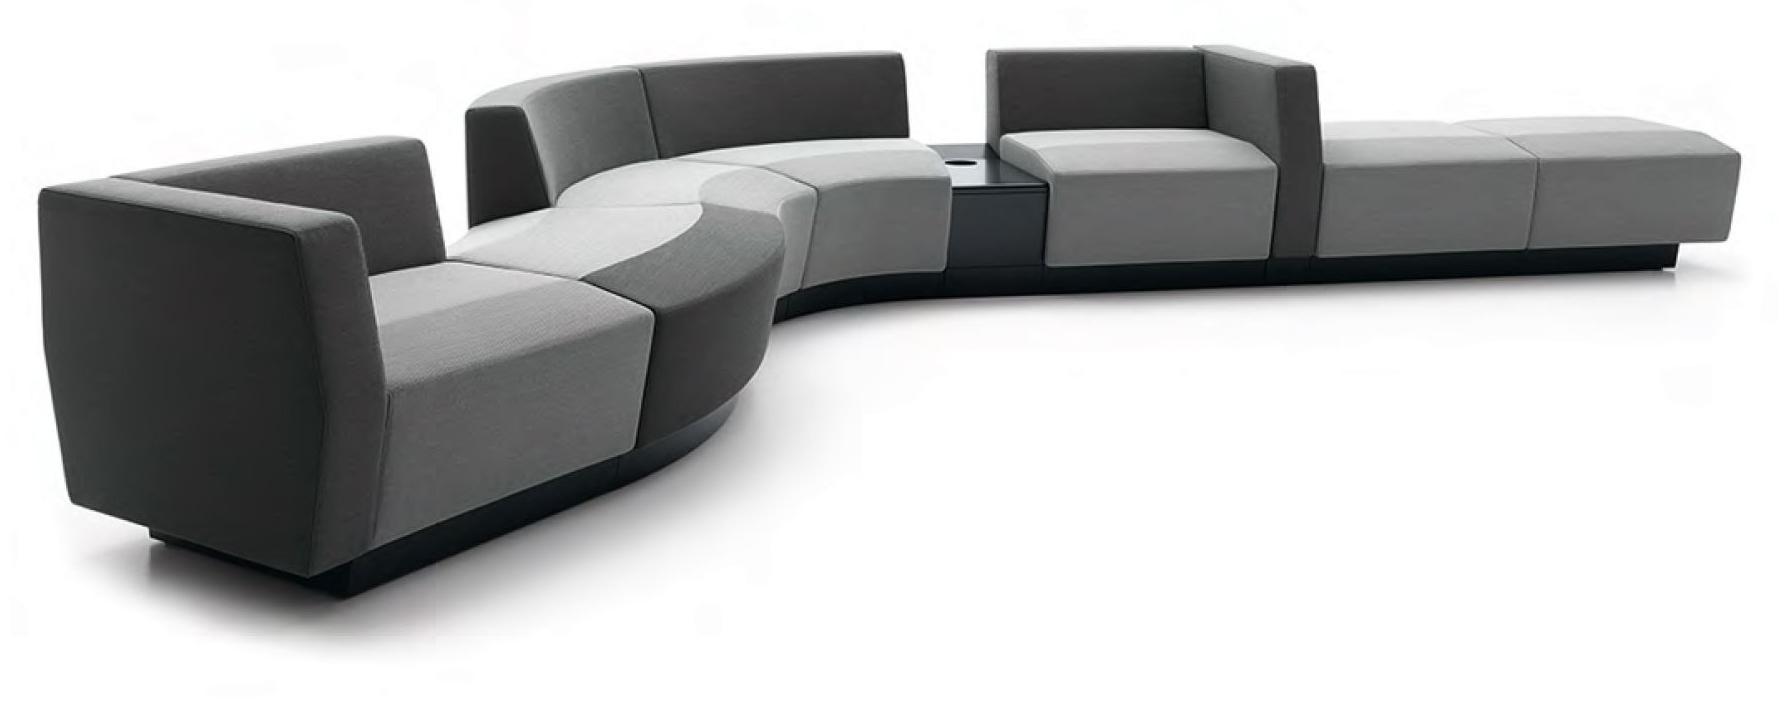 Direct Ergonomics | Sydney Office Furniture | Ergonomic Furniture | Collaborative Seating | Waiting Lounges | Waiting Room Seating | Ergonomic Seating | Park Lounge